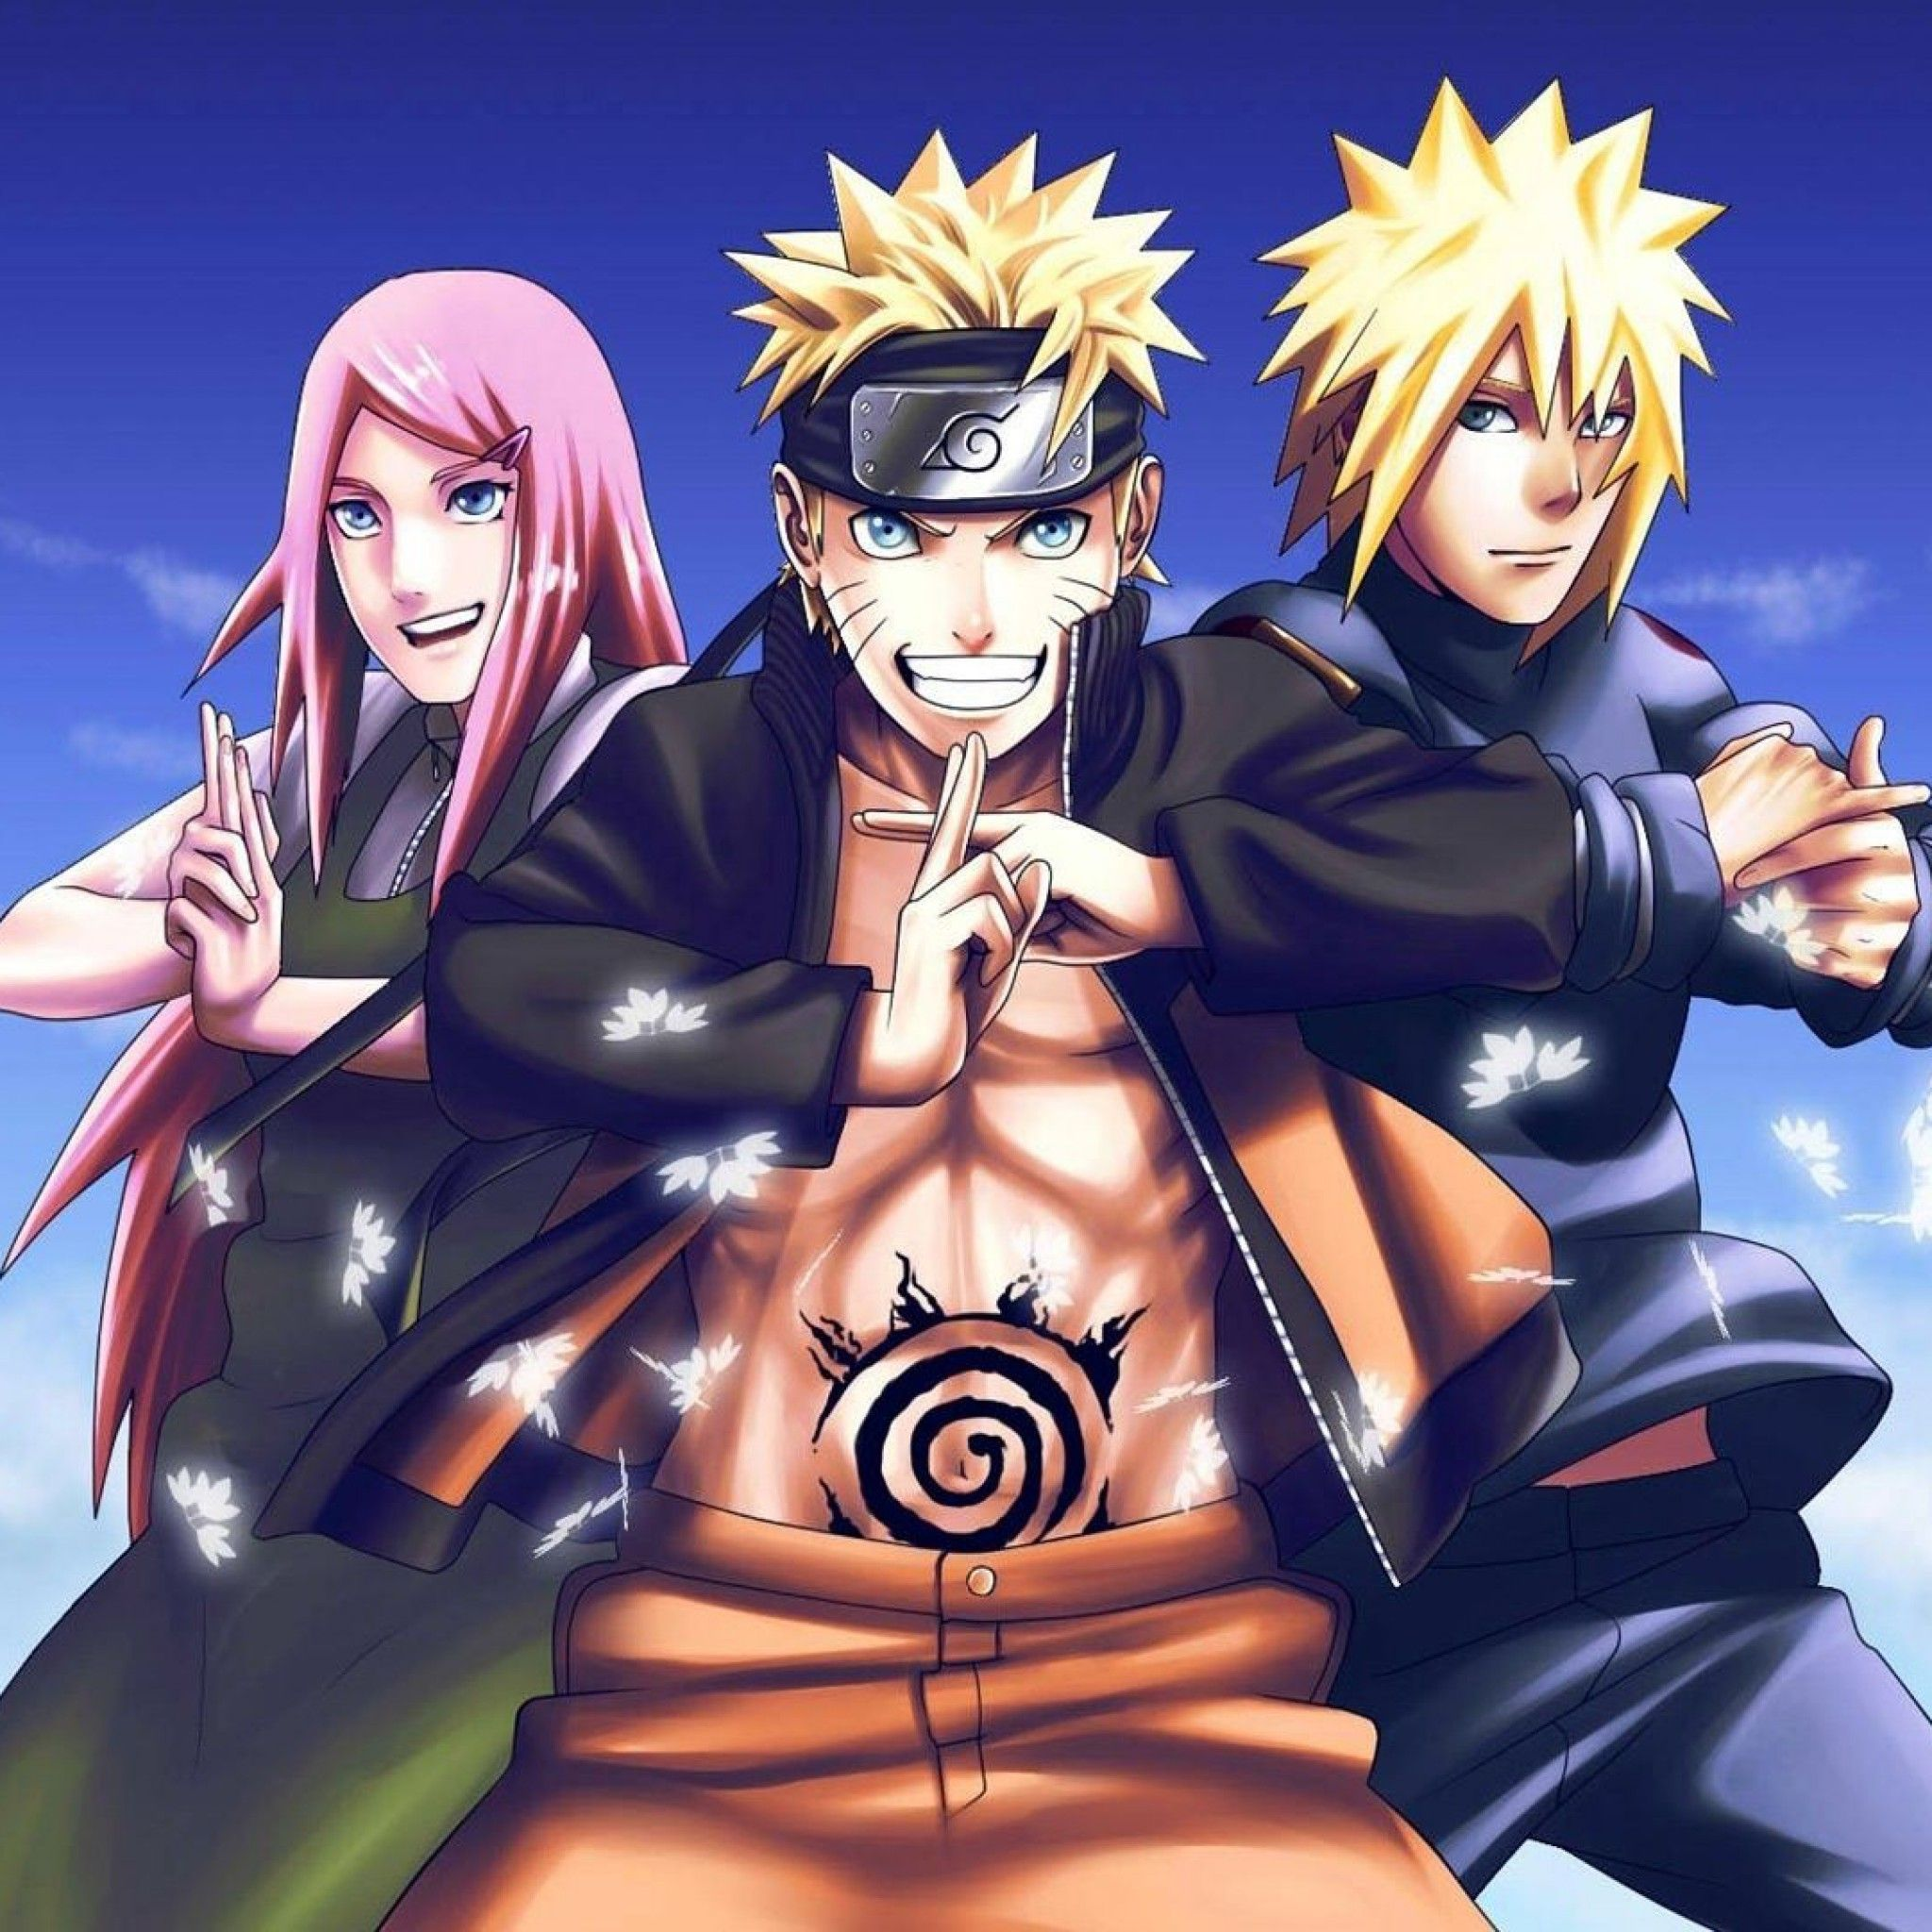 The Anime, Naruto! Tap image for more Naruto Shippuden HD